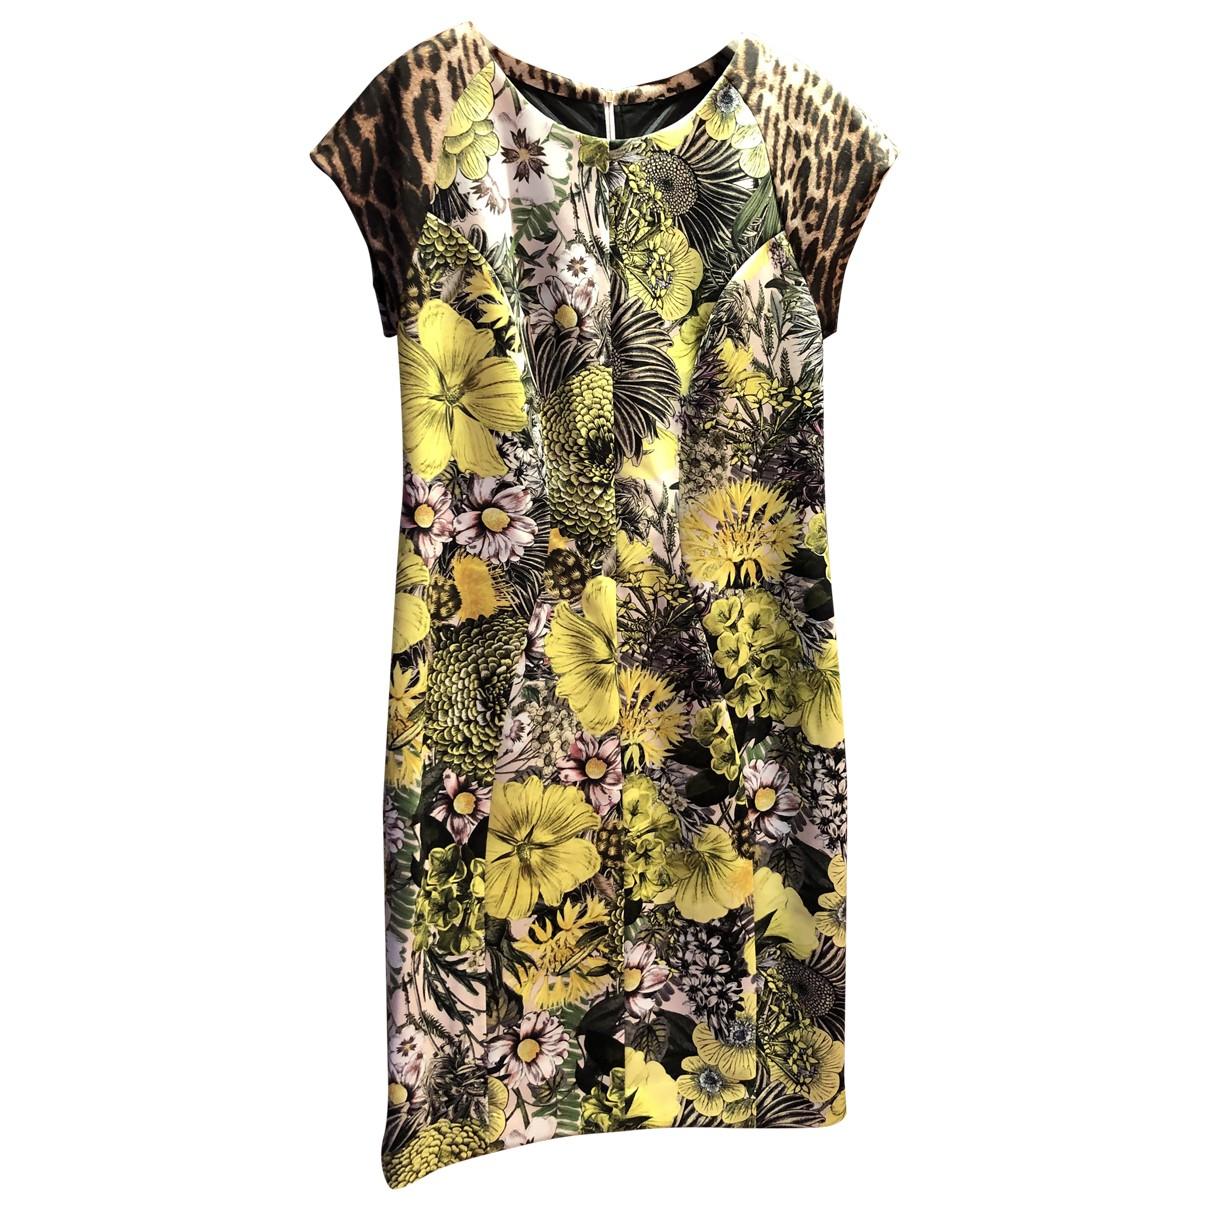 Marc Cain N Multicolour dress for Women 4 0-5